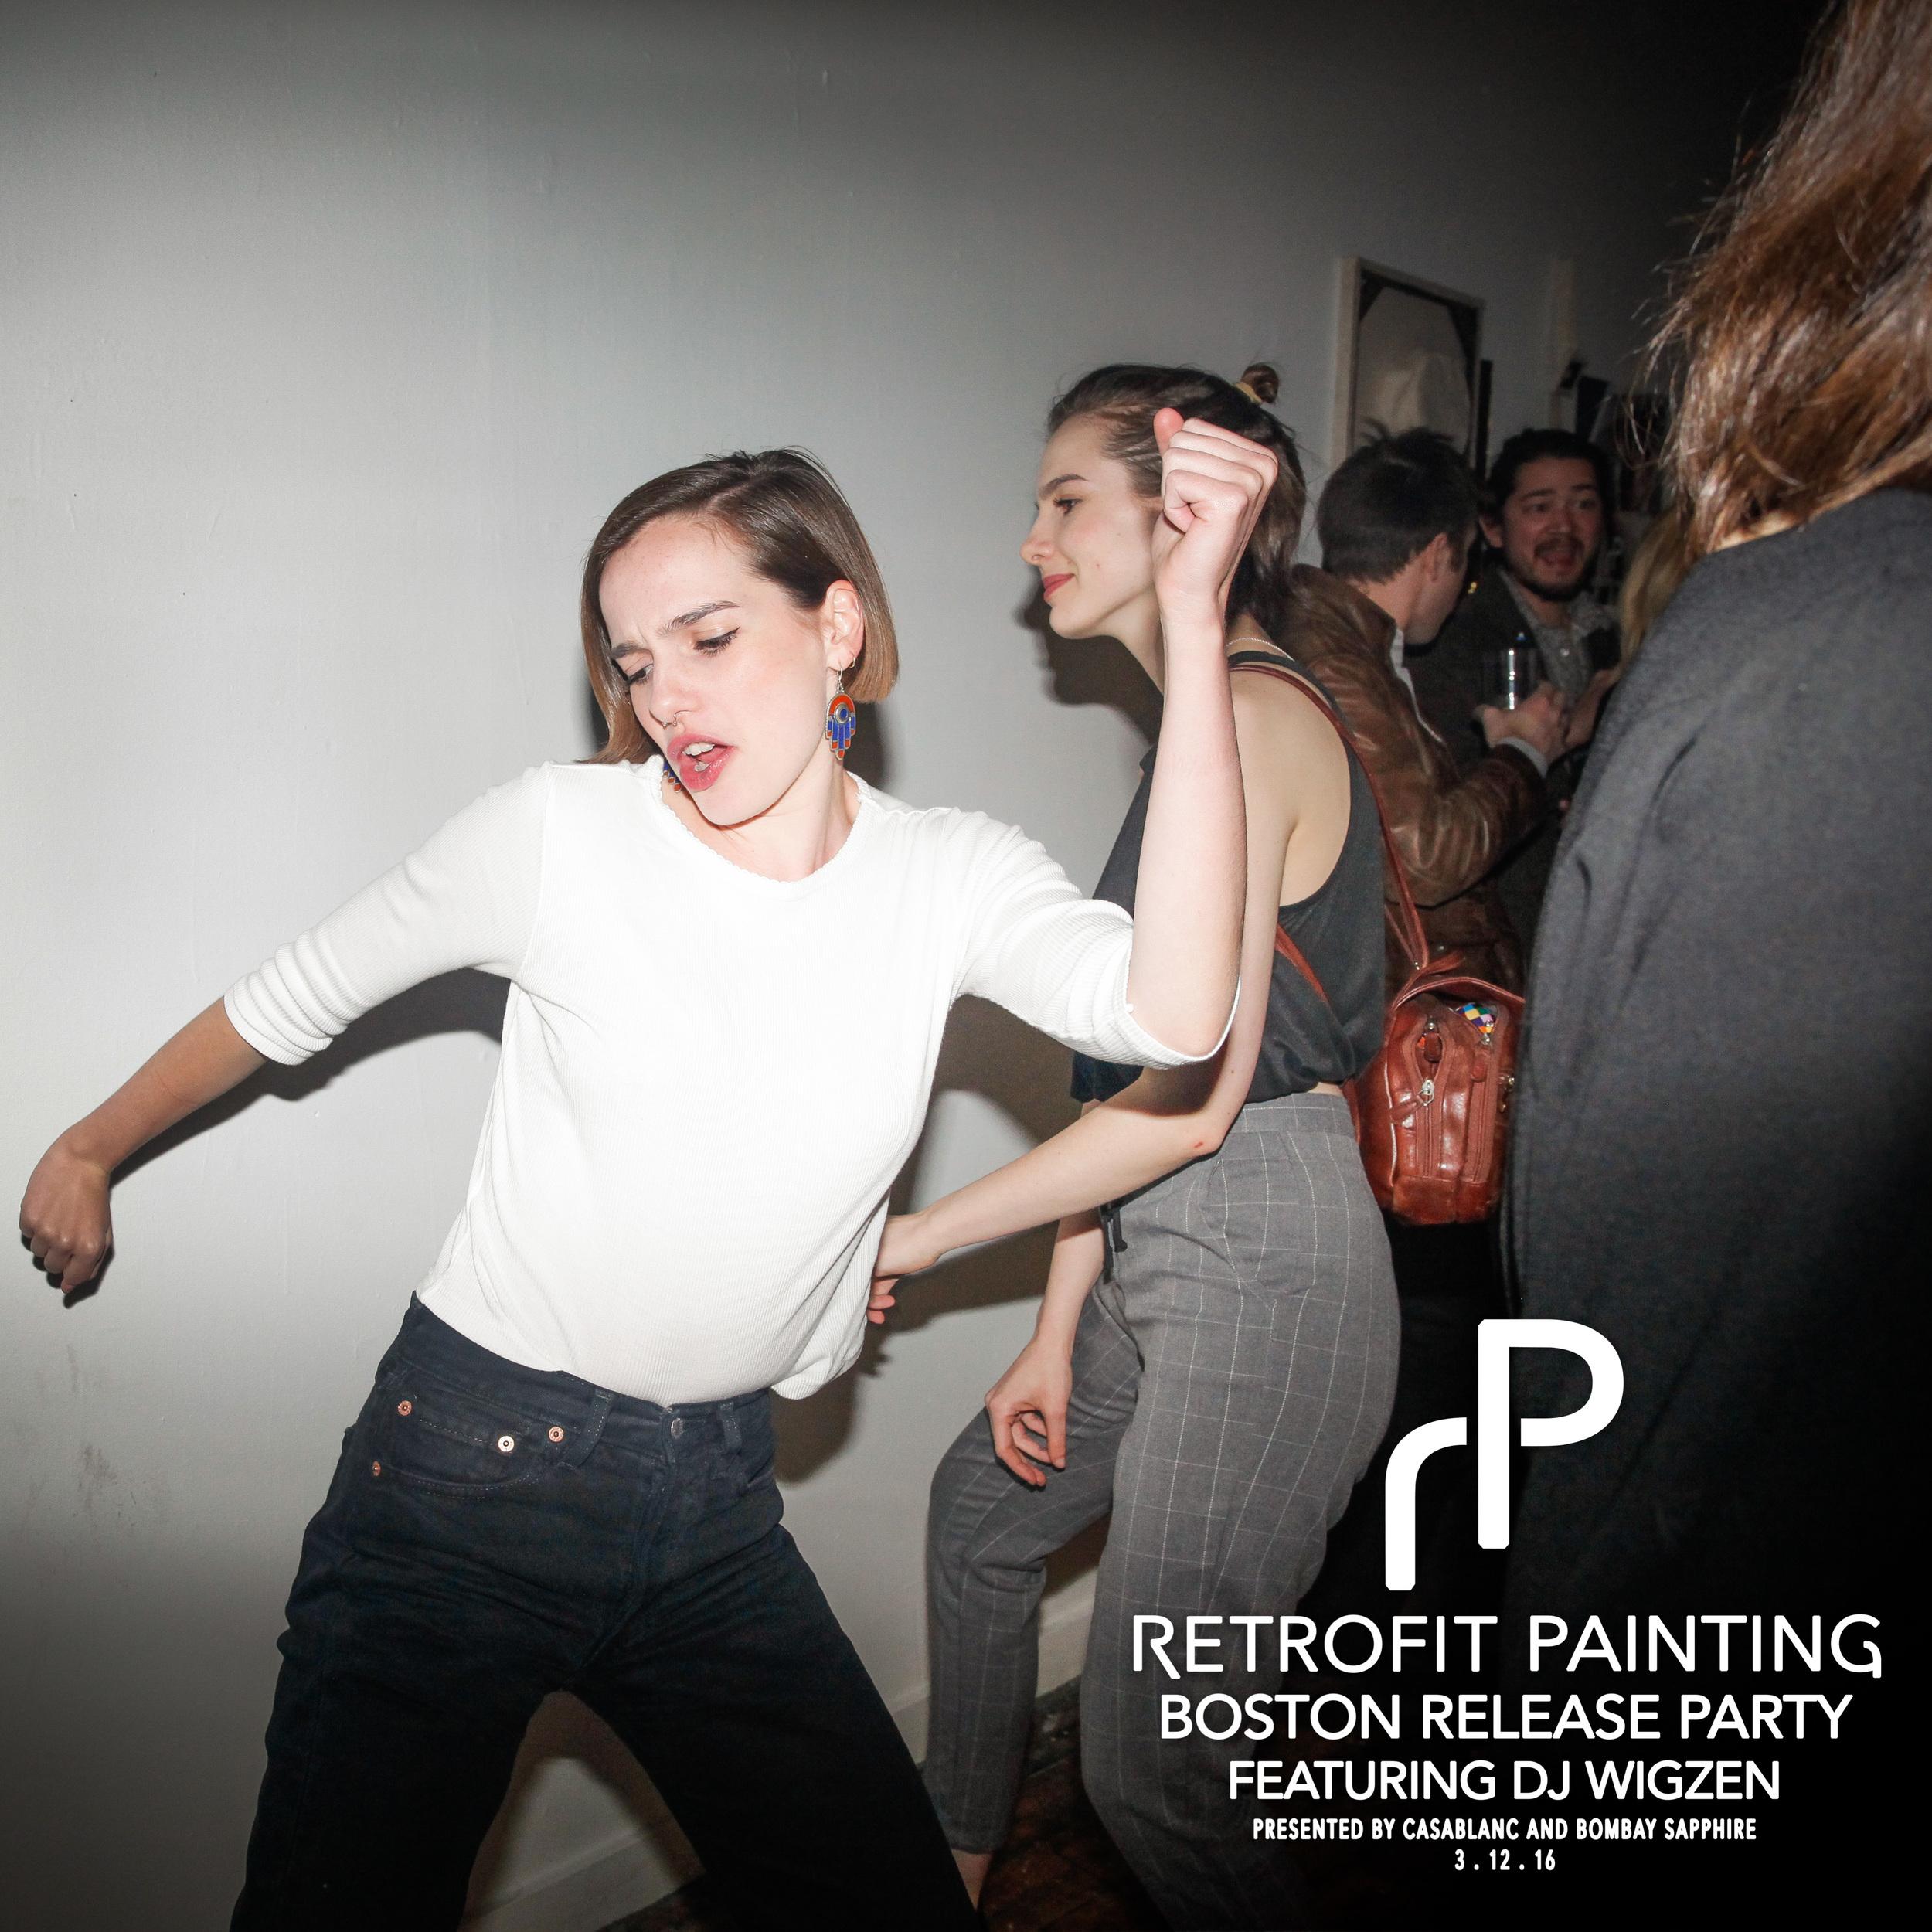 Retrofit Painting Boston Release Party 0130.jpg